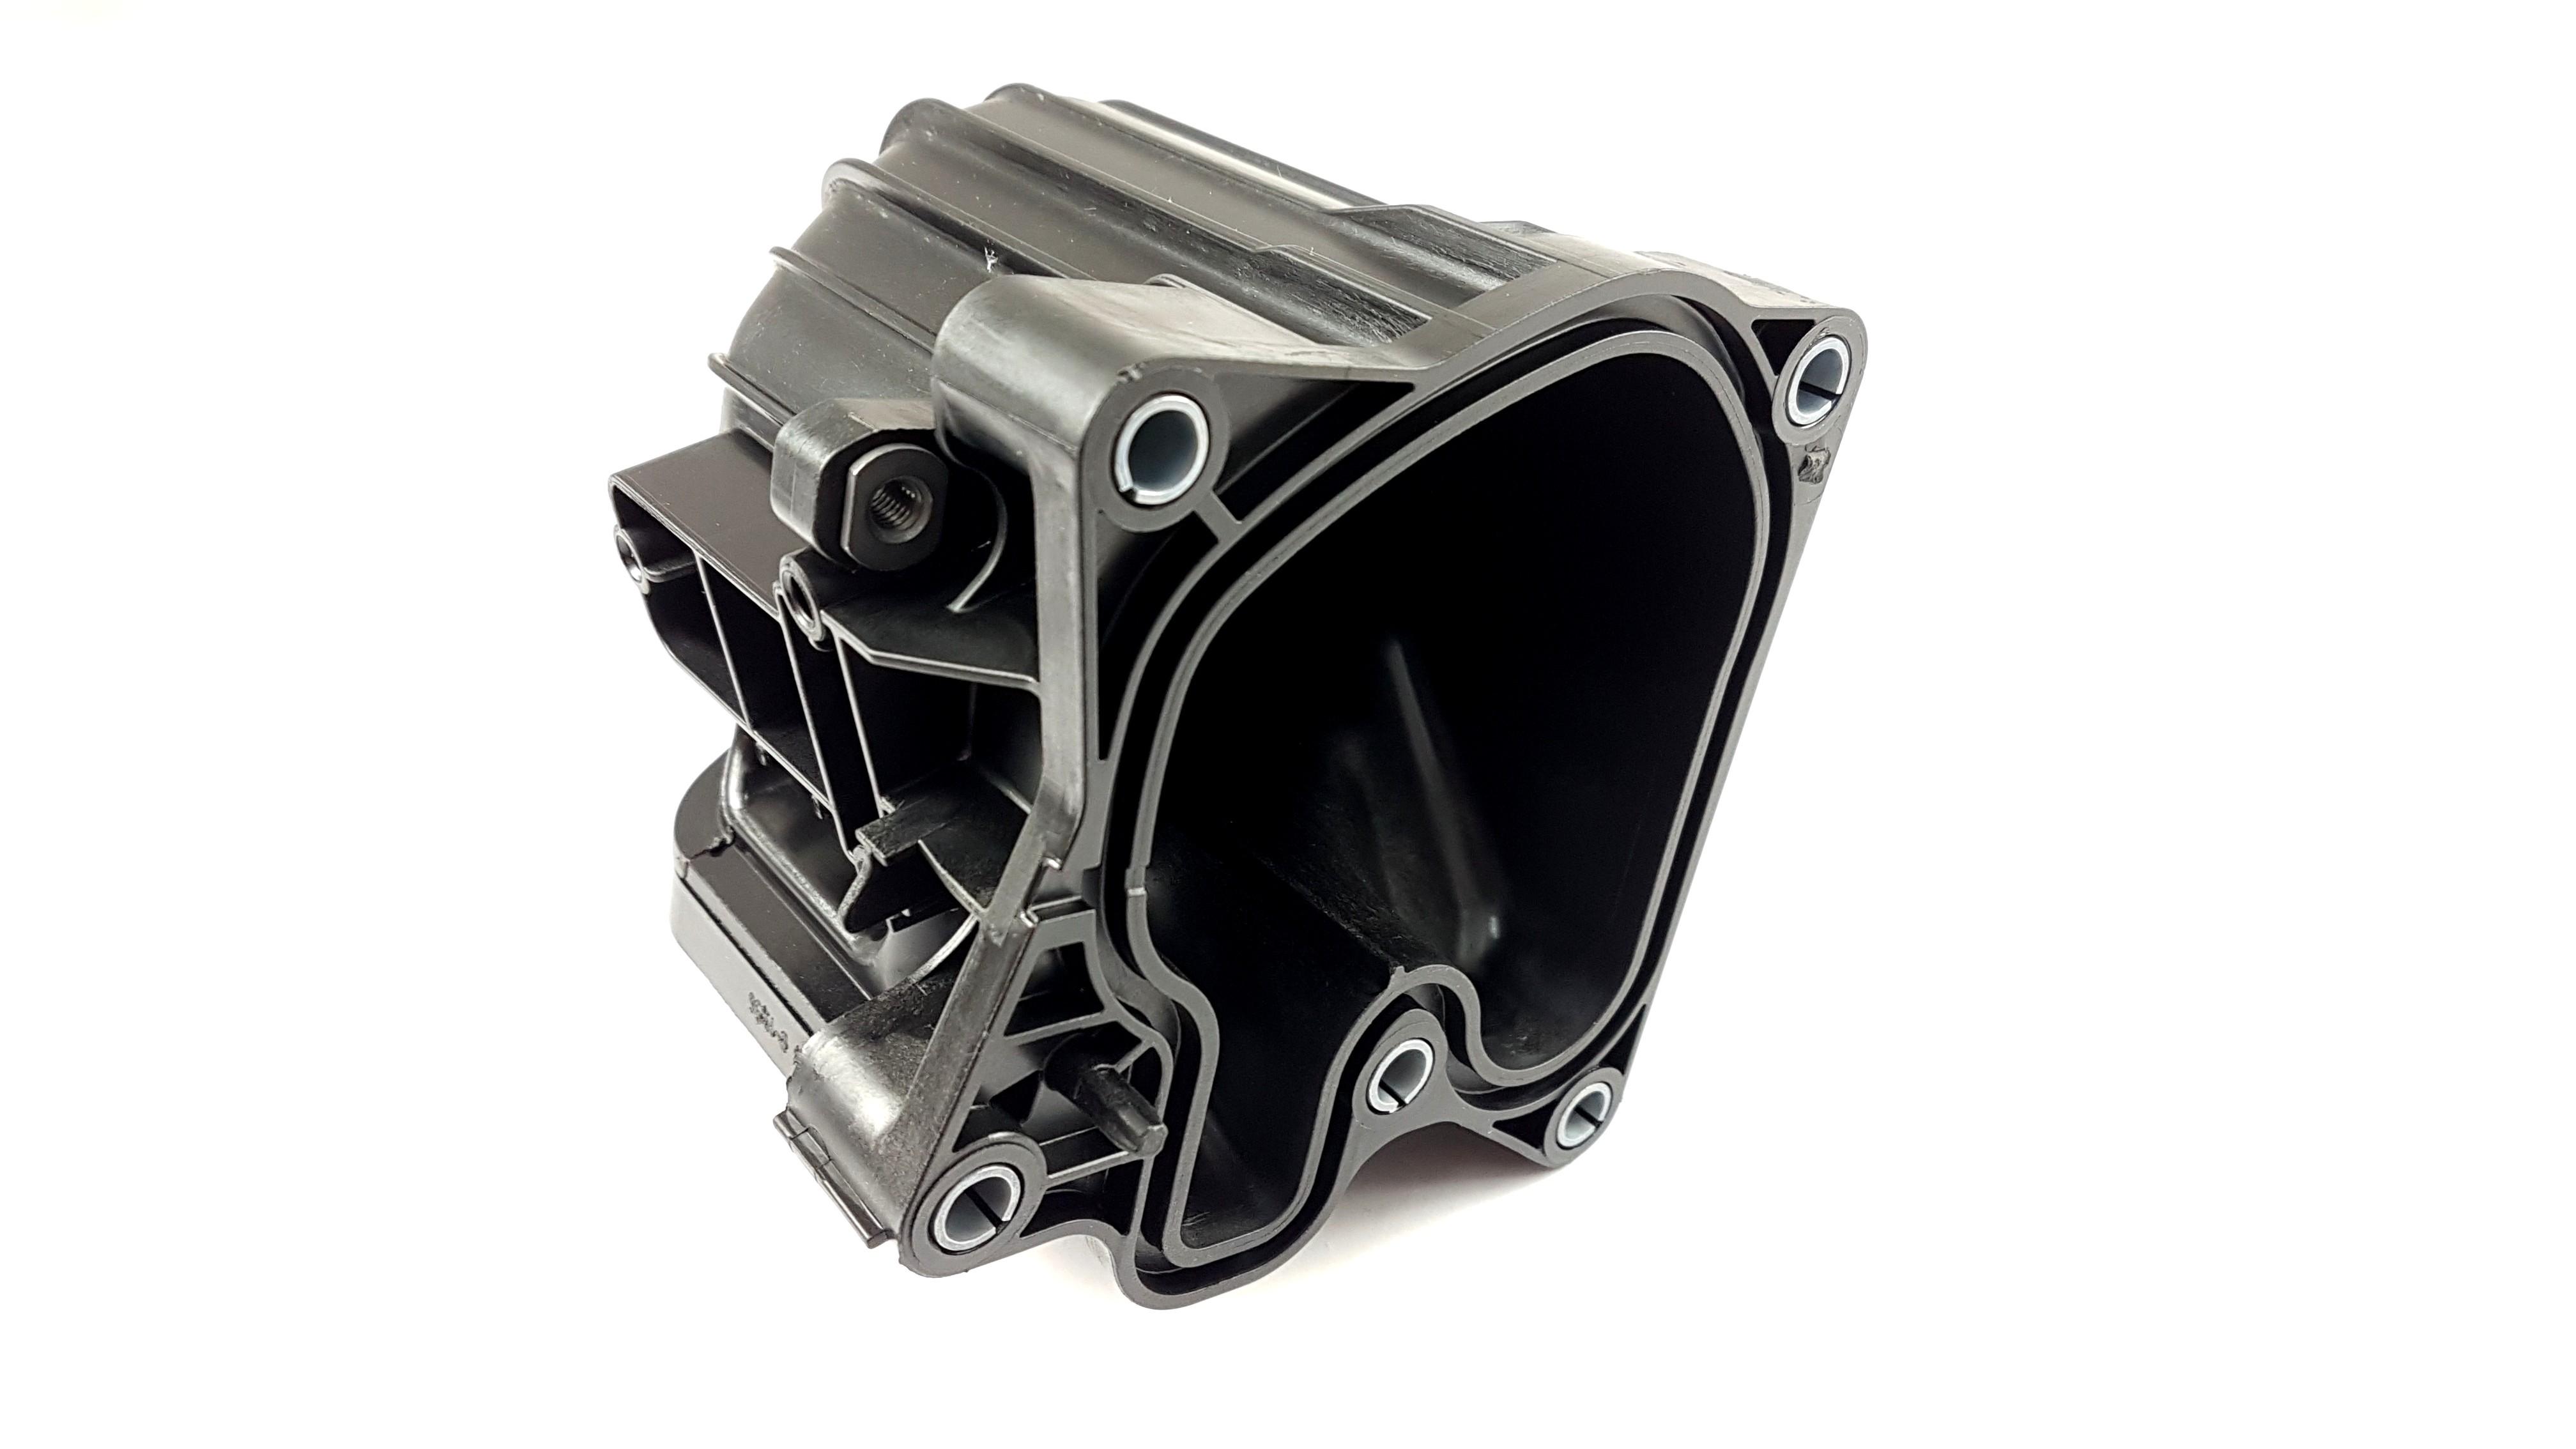 Astra J EGR Valve Cooler Reapir Kit 55590953 Genuine Vauxhall Insignia Zafira